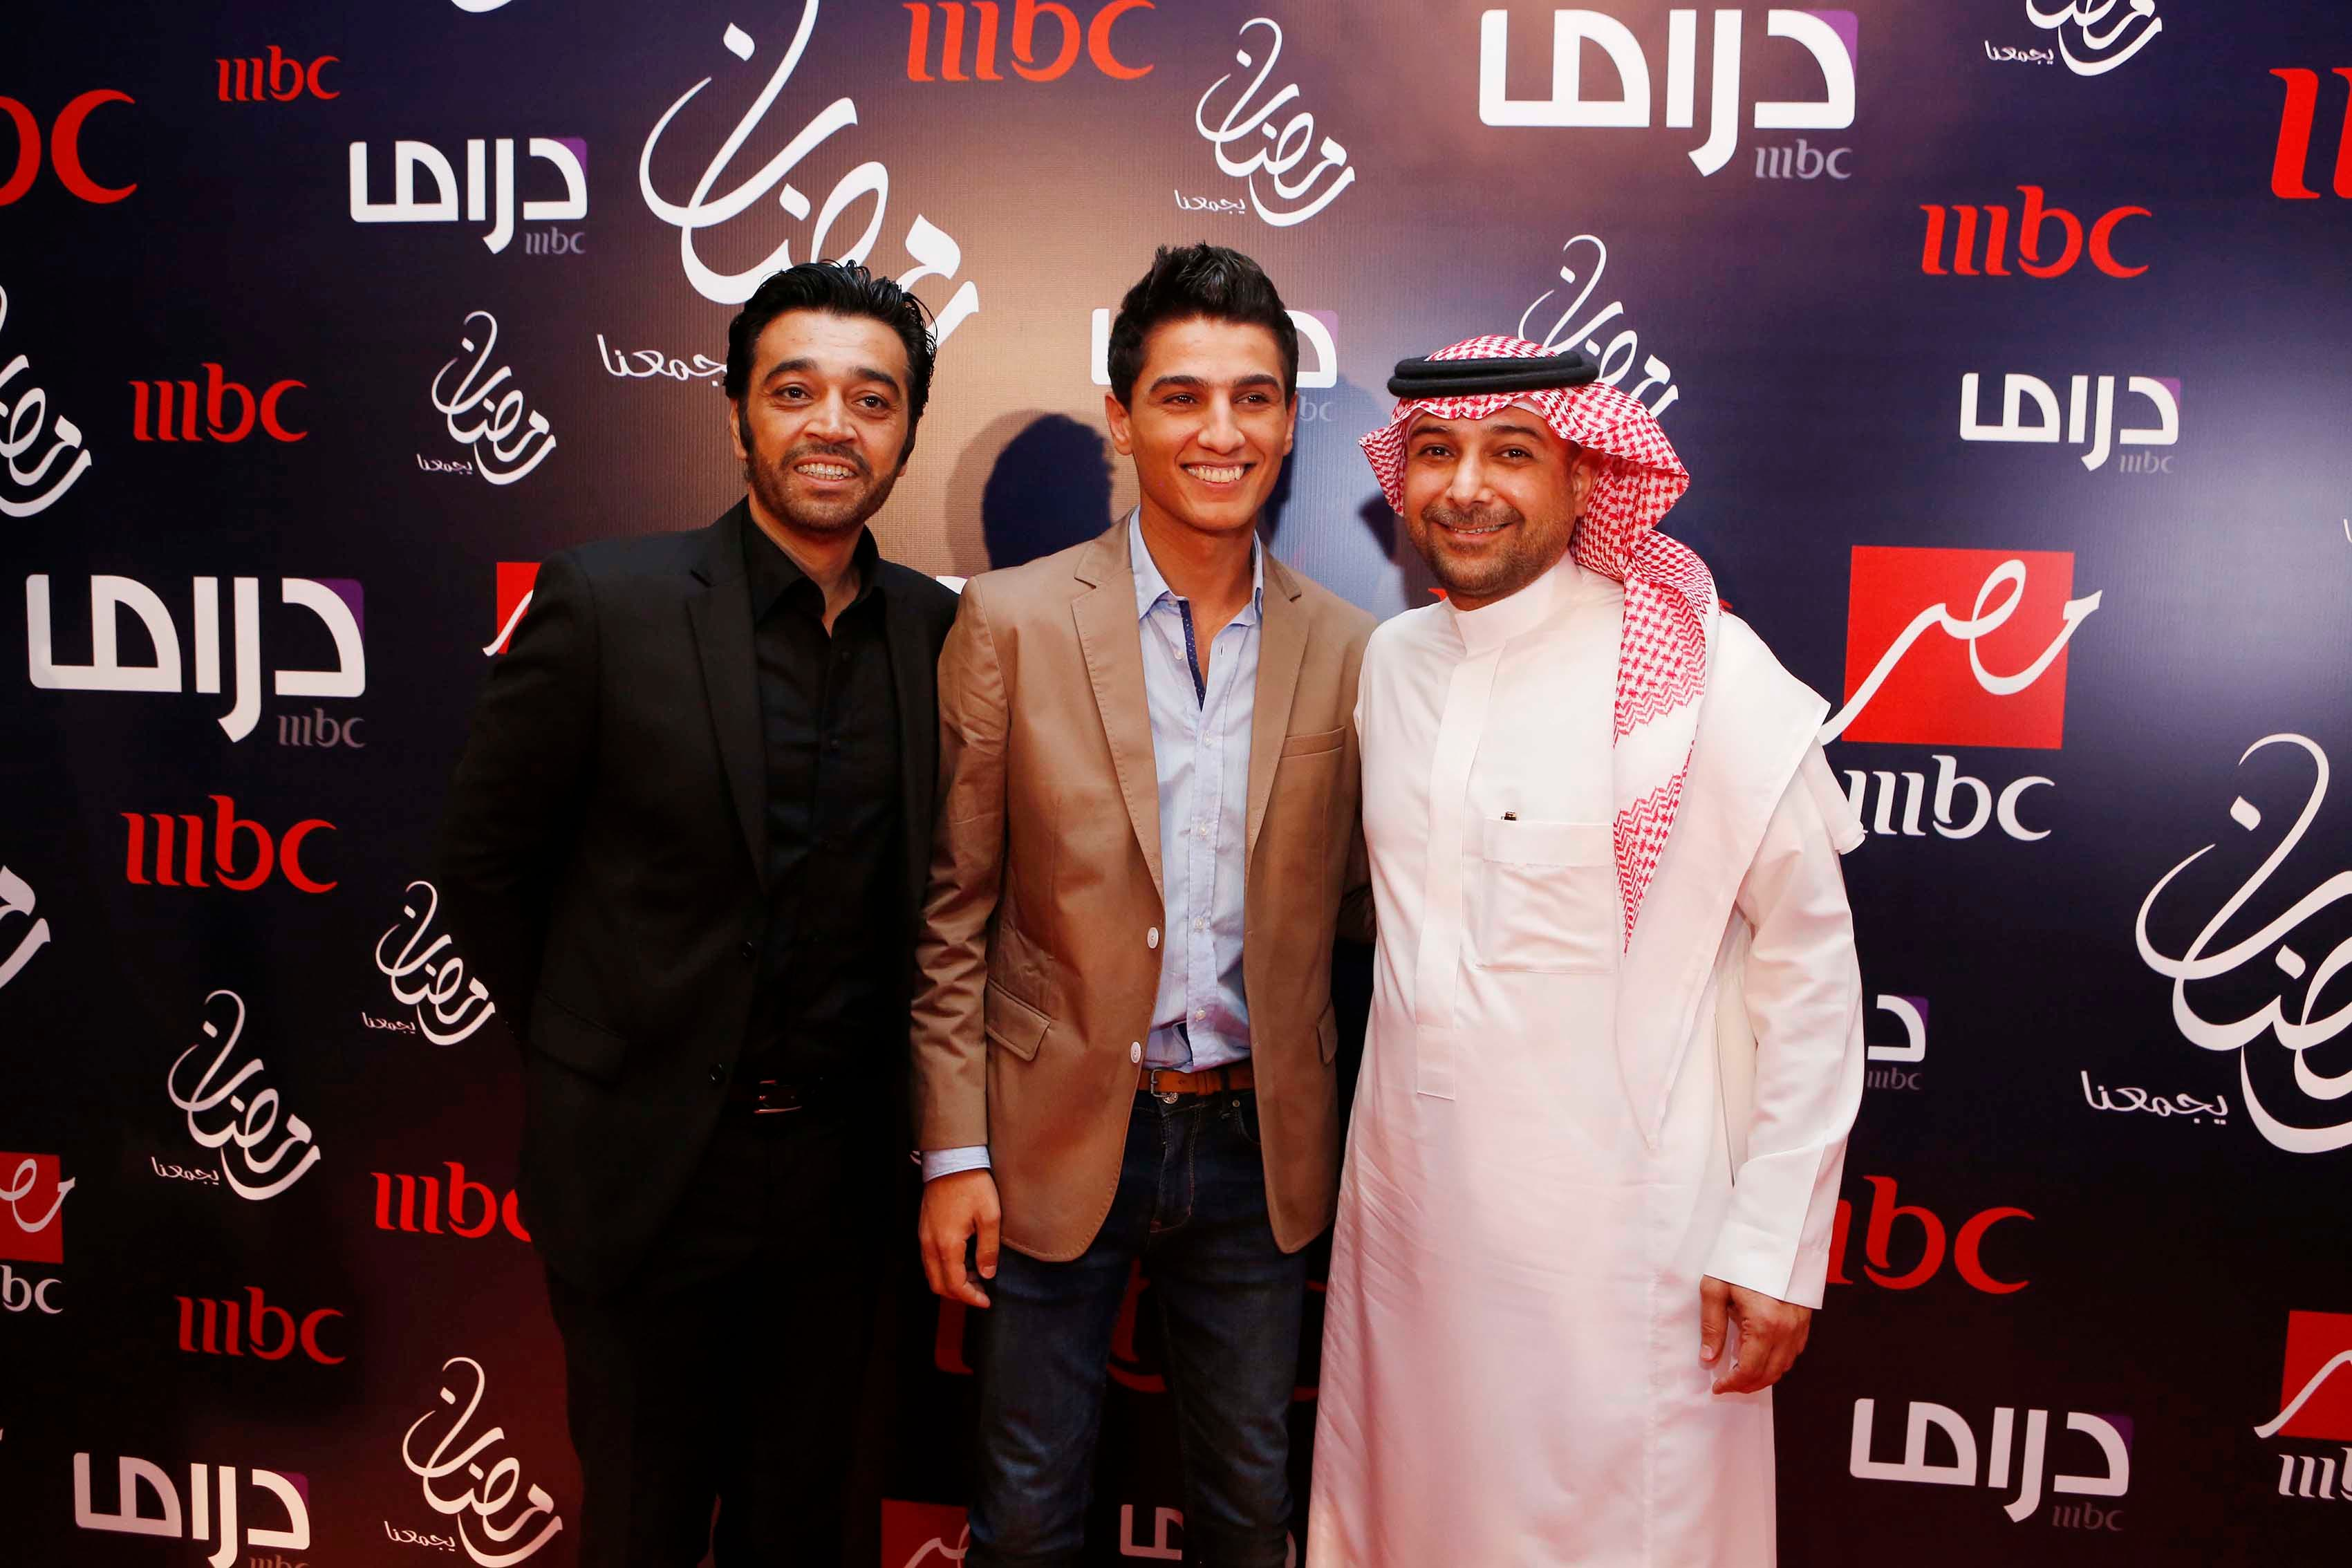 Mohammed Al Mulhem (L) with Arab Idol winner Mohammed Assaf (C) and Essam Kamal (R)